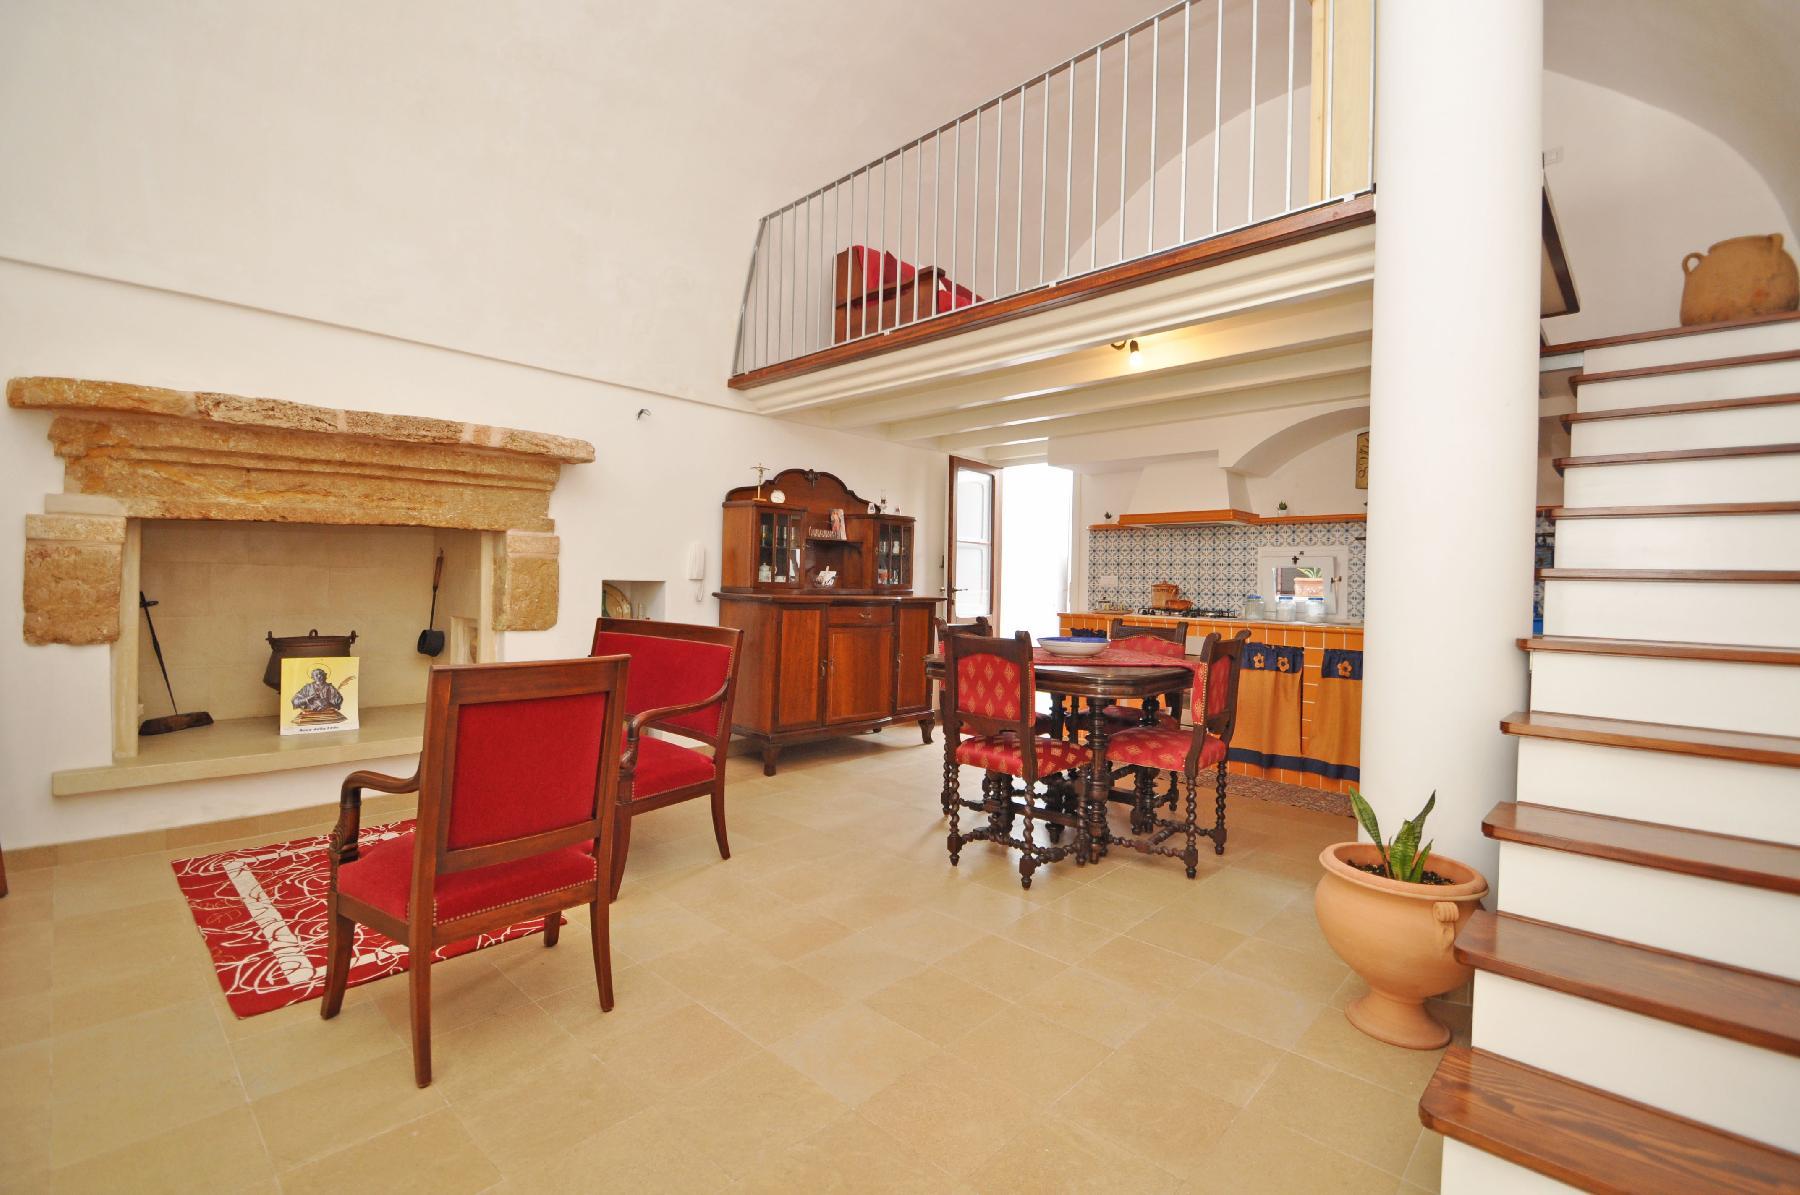 APULIA - BEAUTIFUL HOUSE IN OLD TOWN - CORTE SANTA MARIA 1